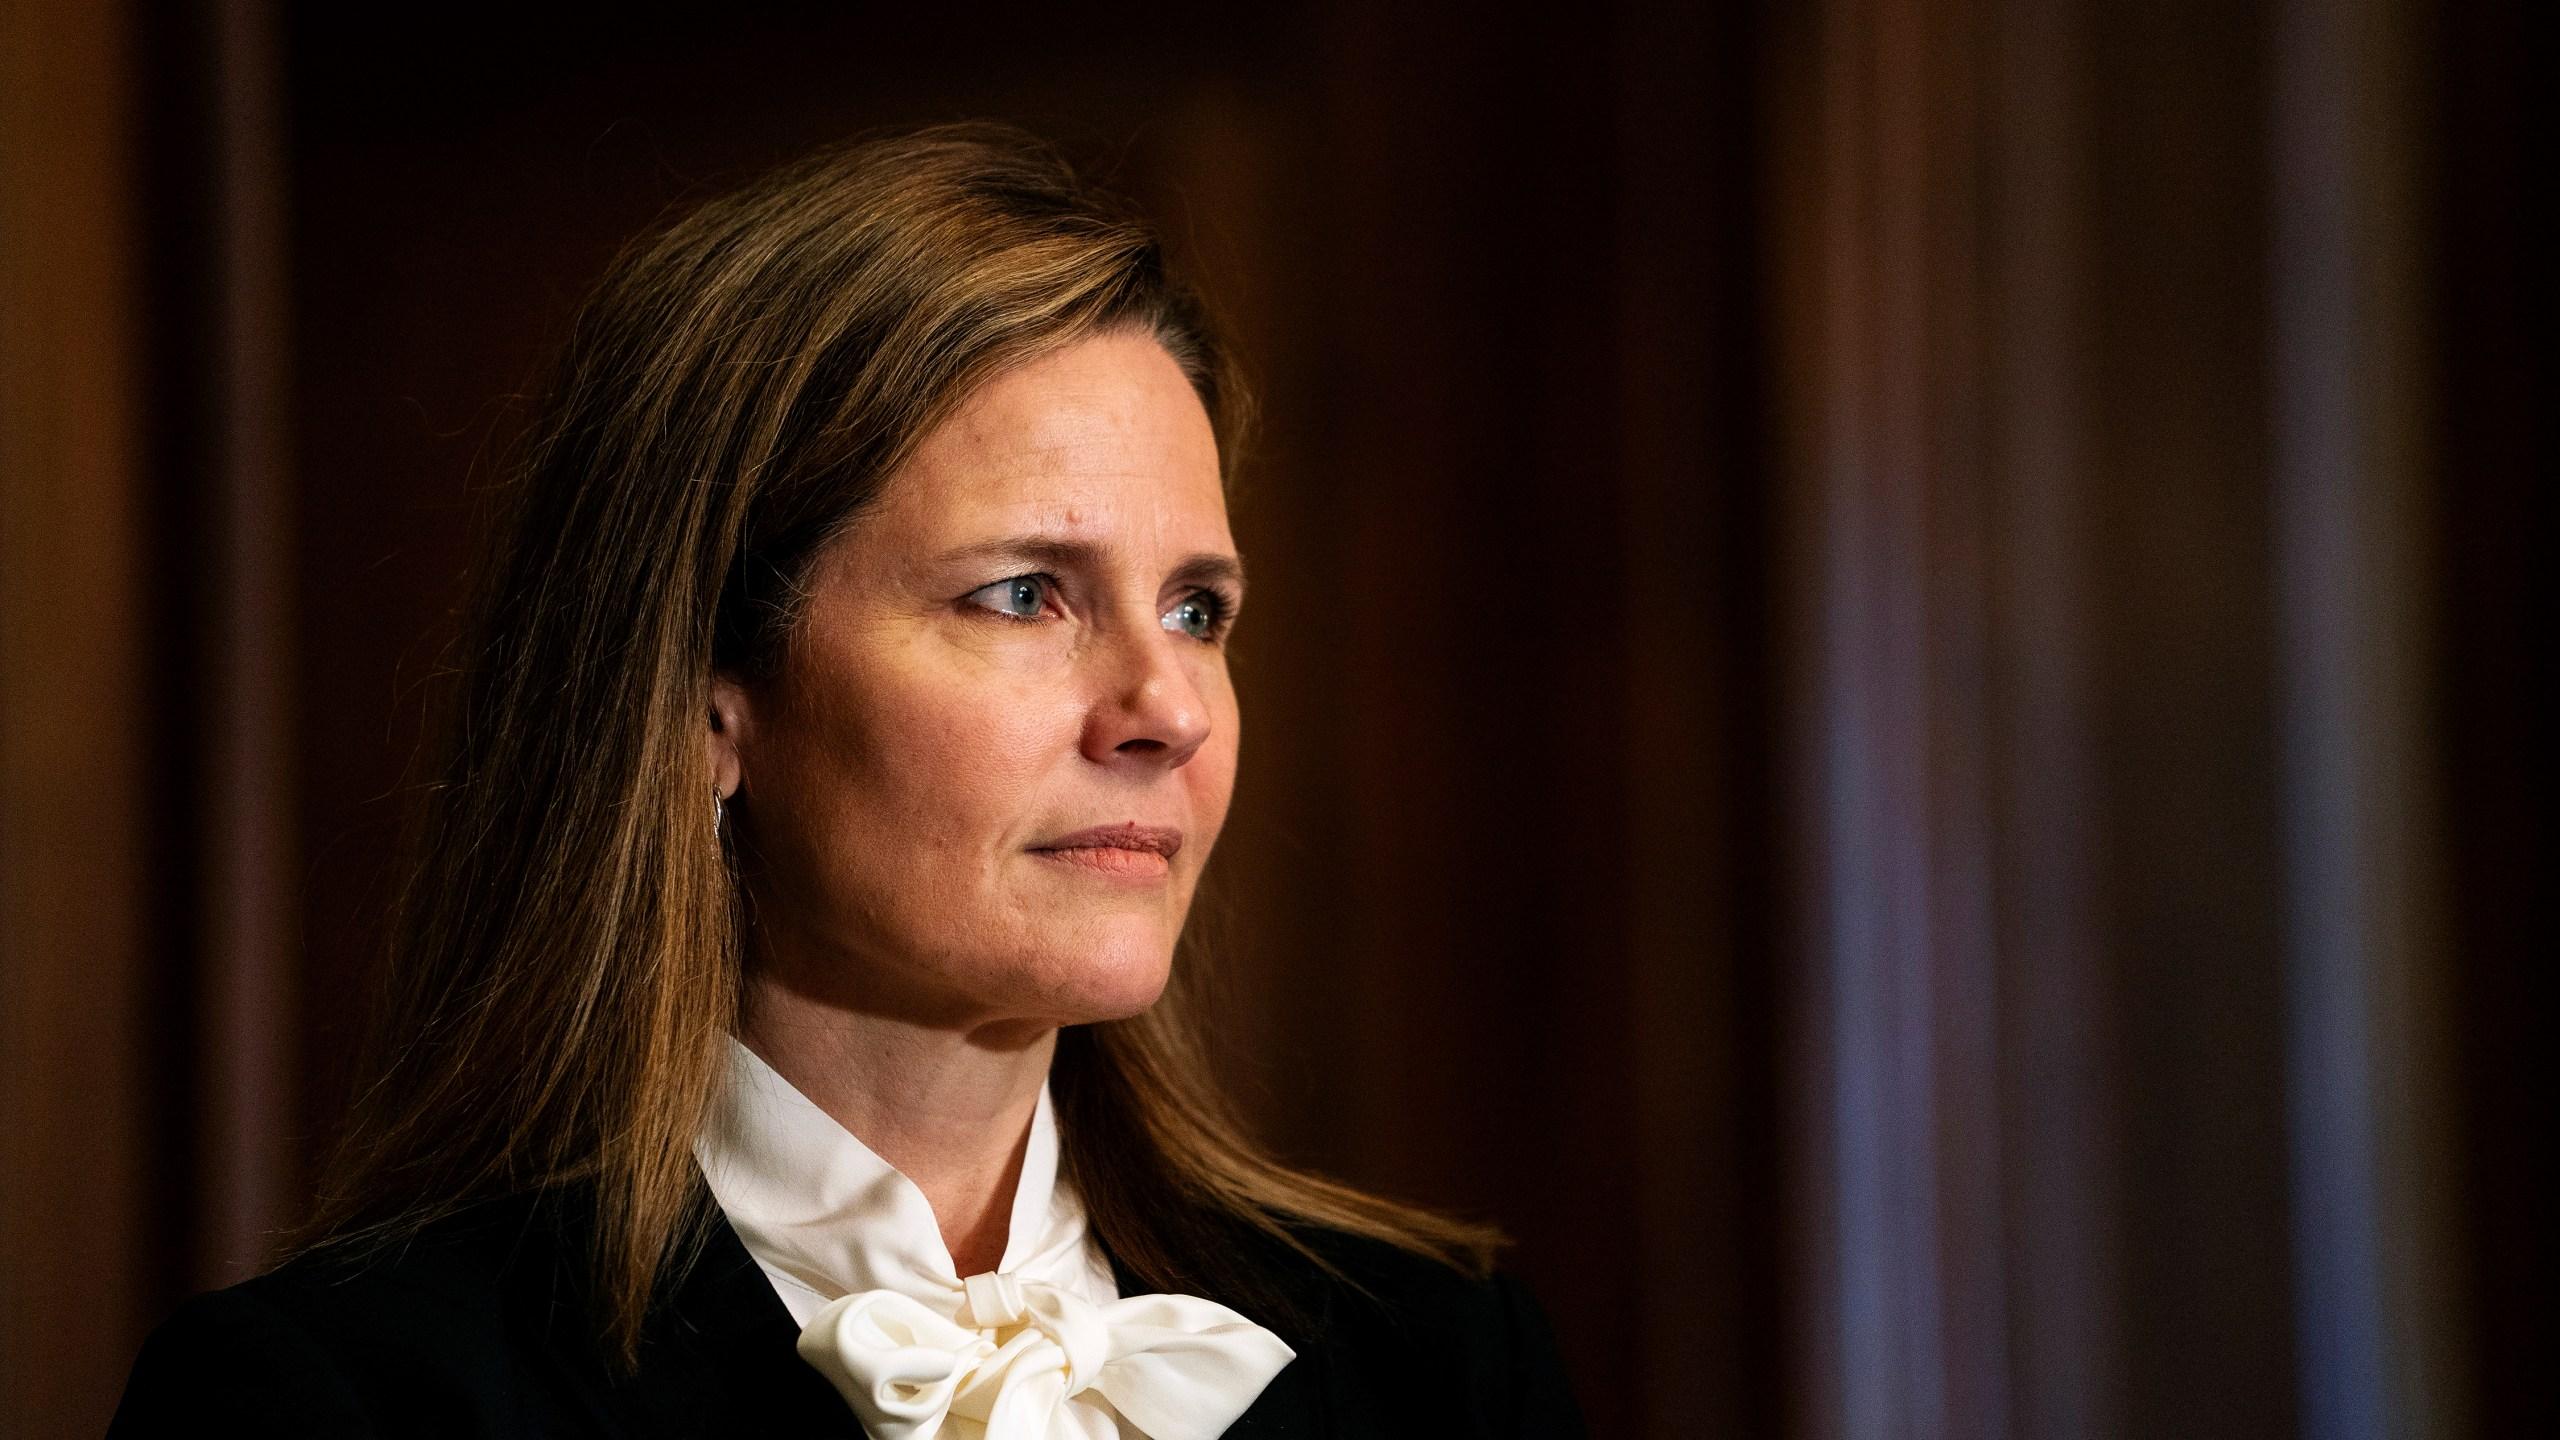 Republicans Push For Amy Coney Barrett S Supreme Court Confirmation Despite Senate Shut Down Due To Covid 19 Infections Ktla